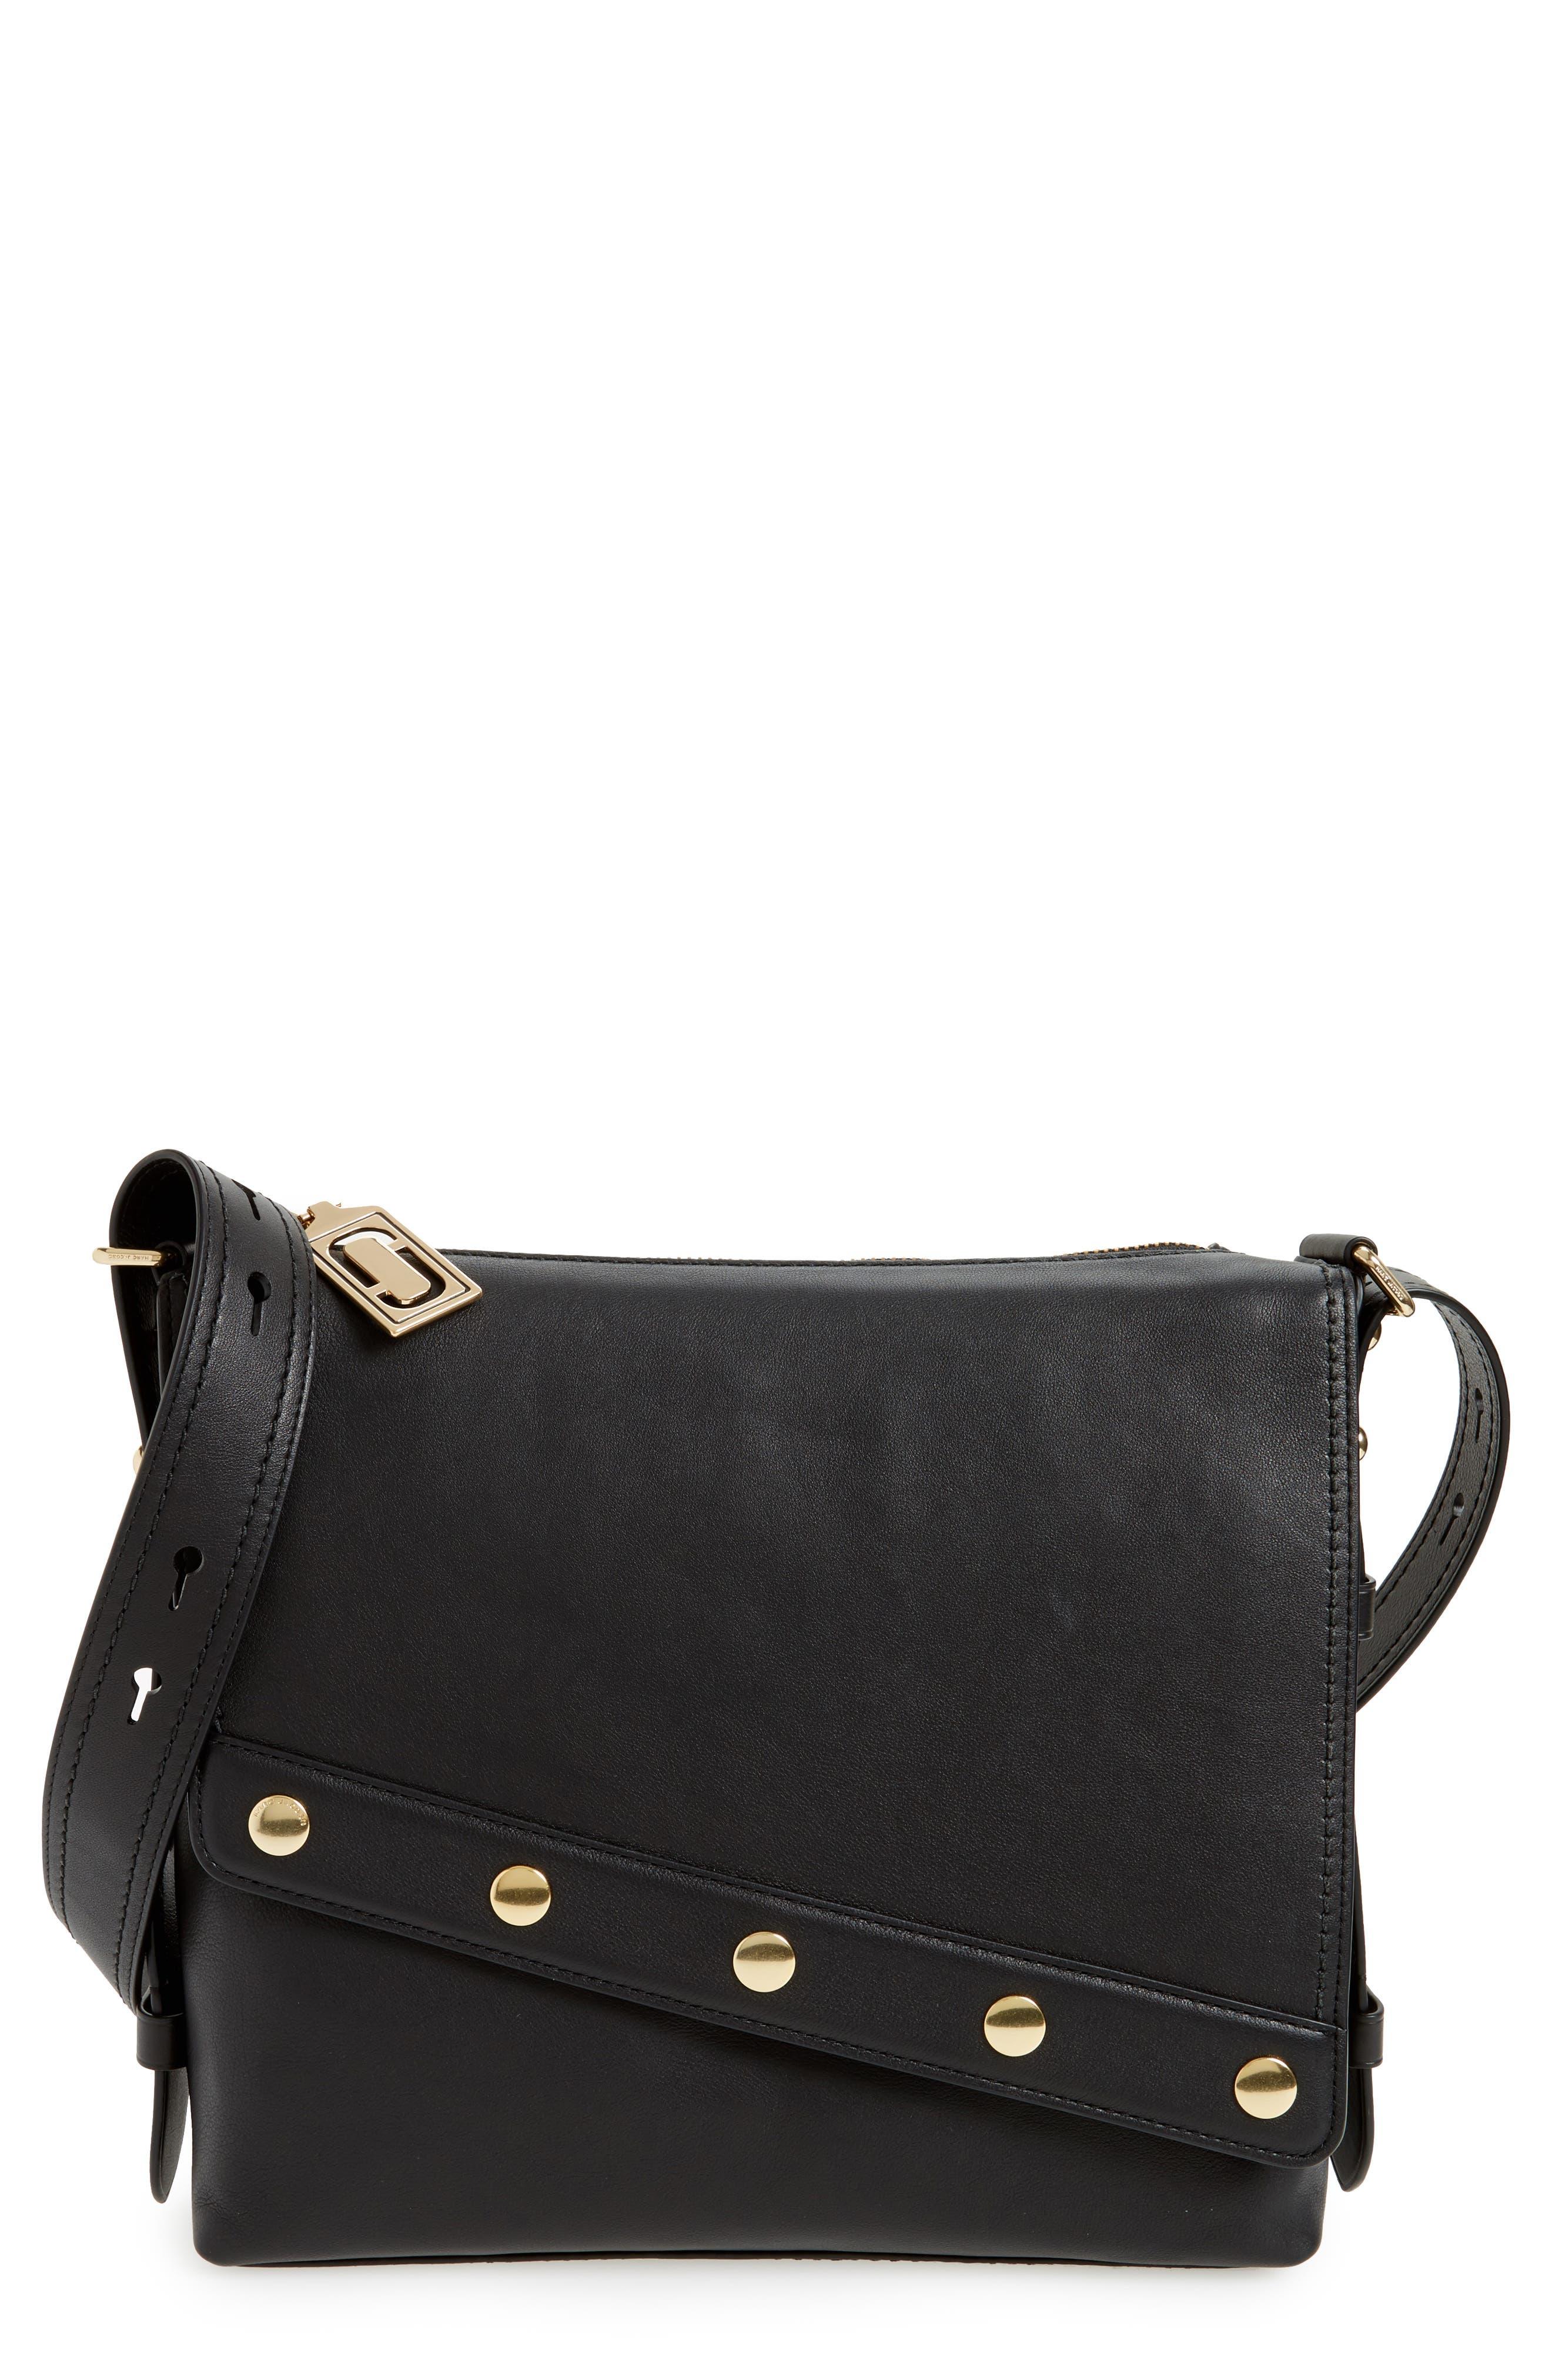 Alternate Image 1 Selected - MARC JACOBS Downtown Stud Leather Shoulder Bag